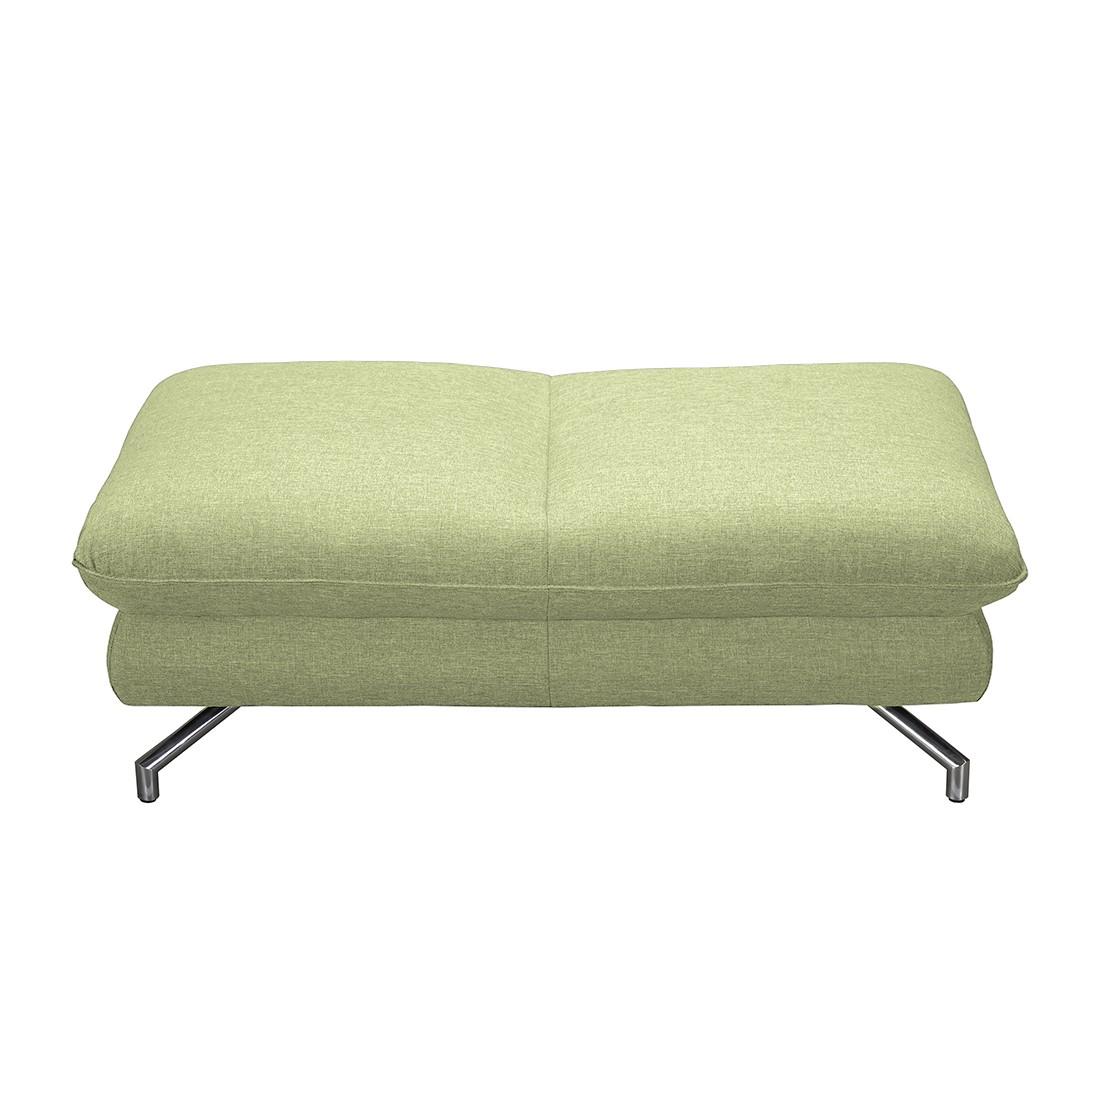 Hocker Enrico – Webstoff Grün, loftscape günstig bestellen